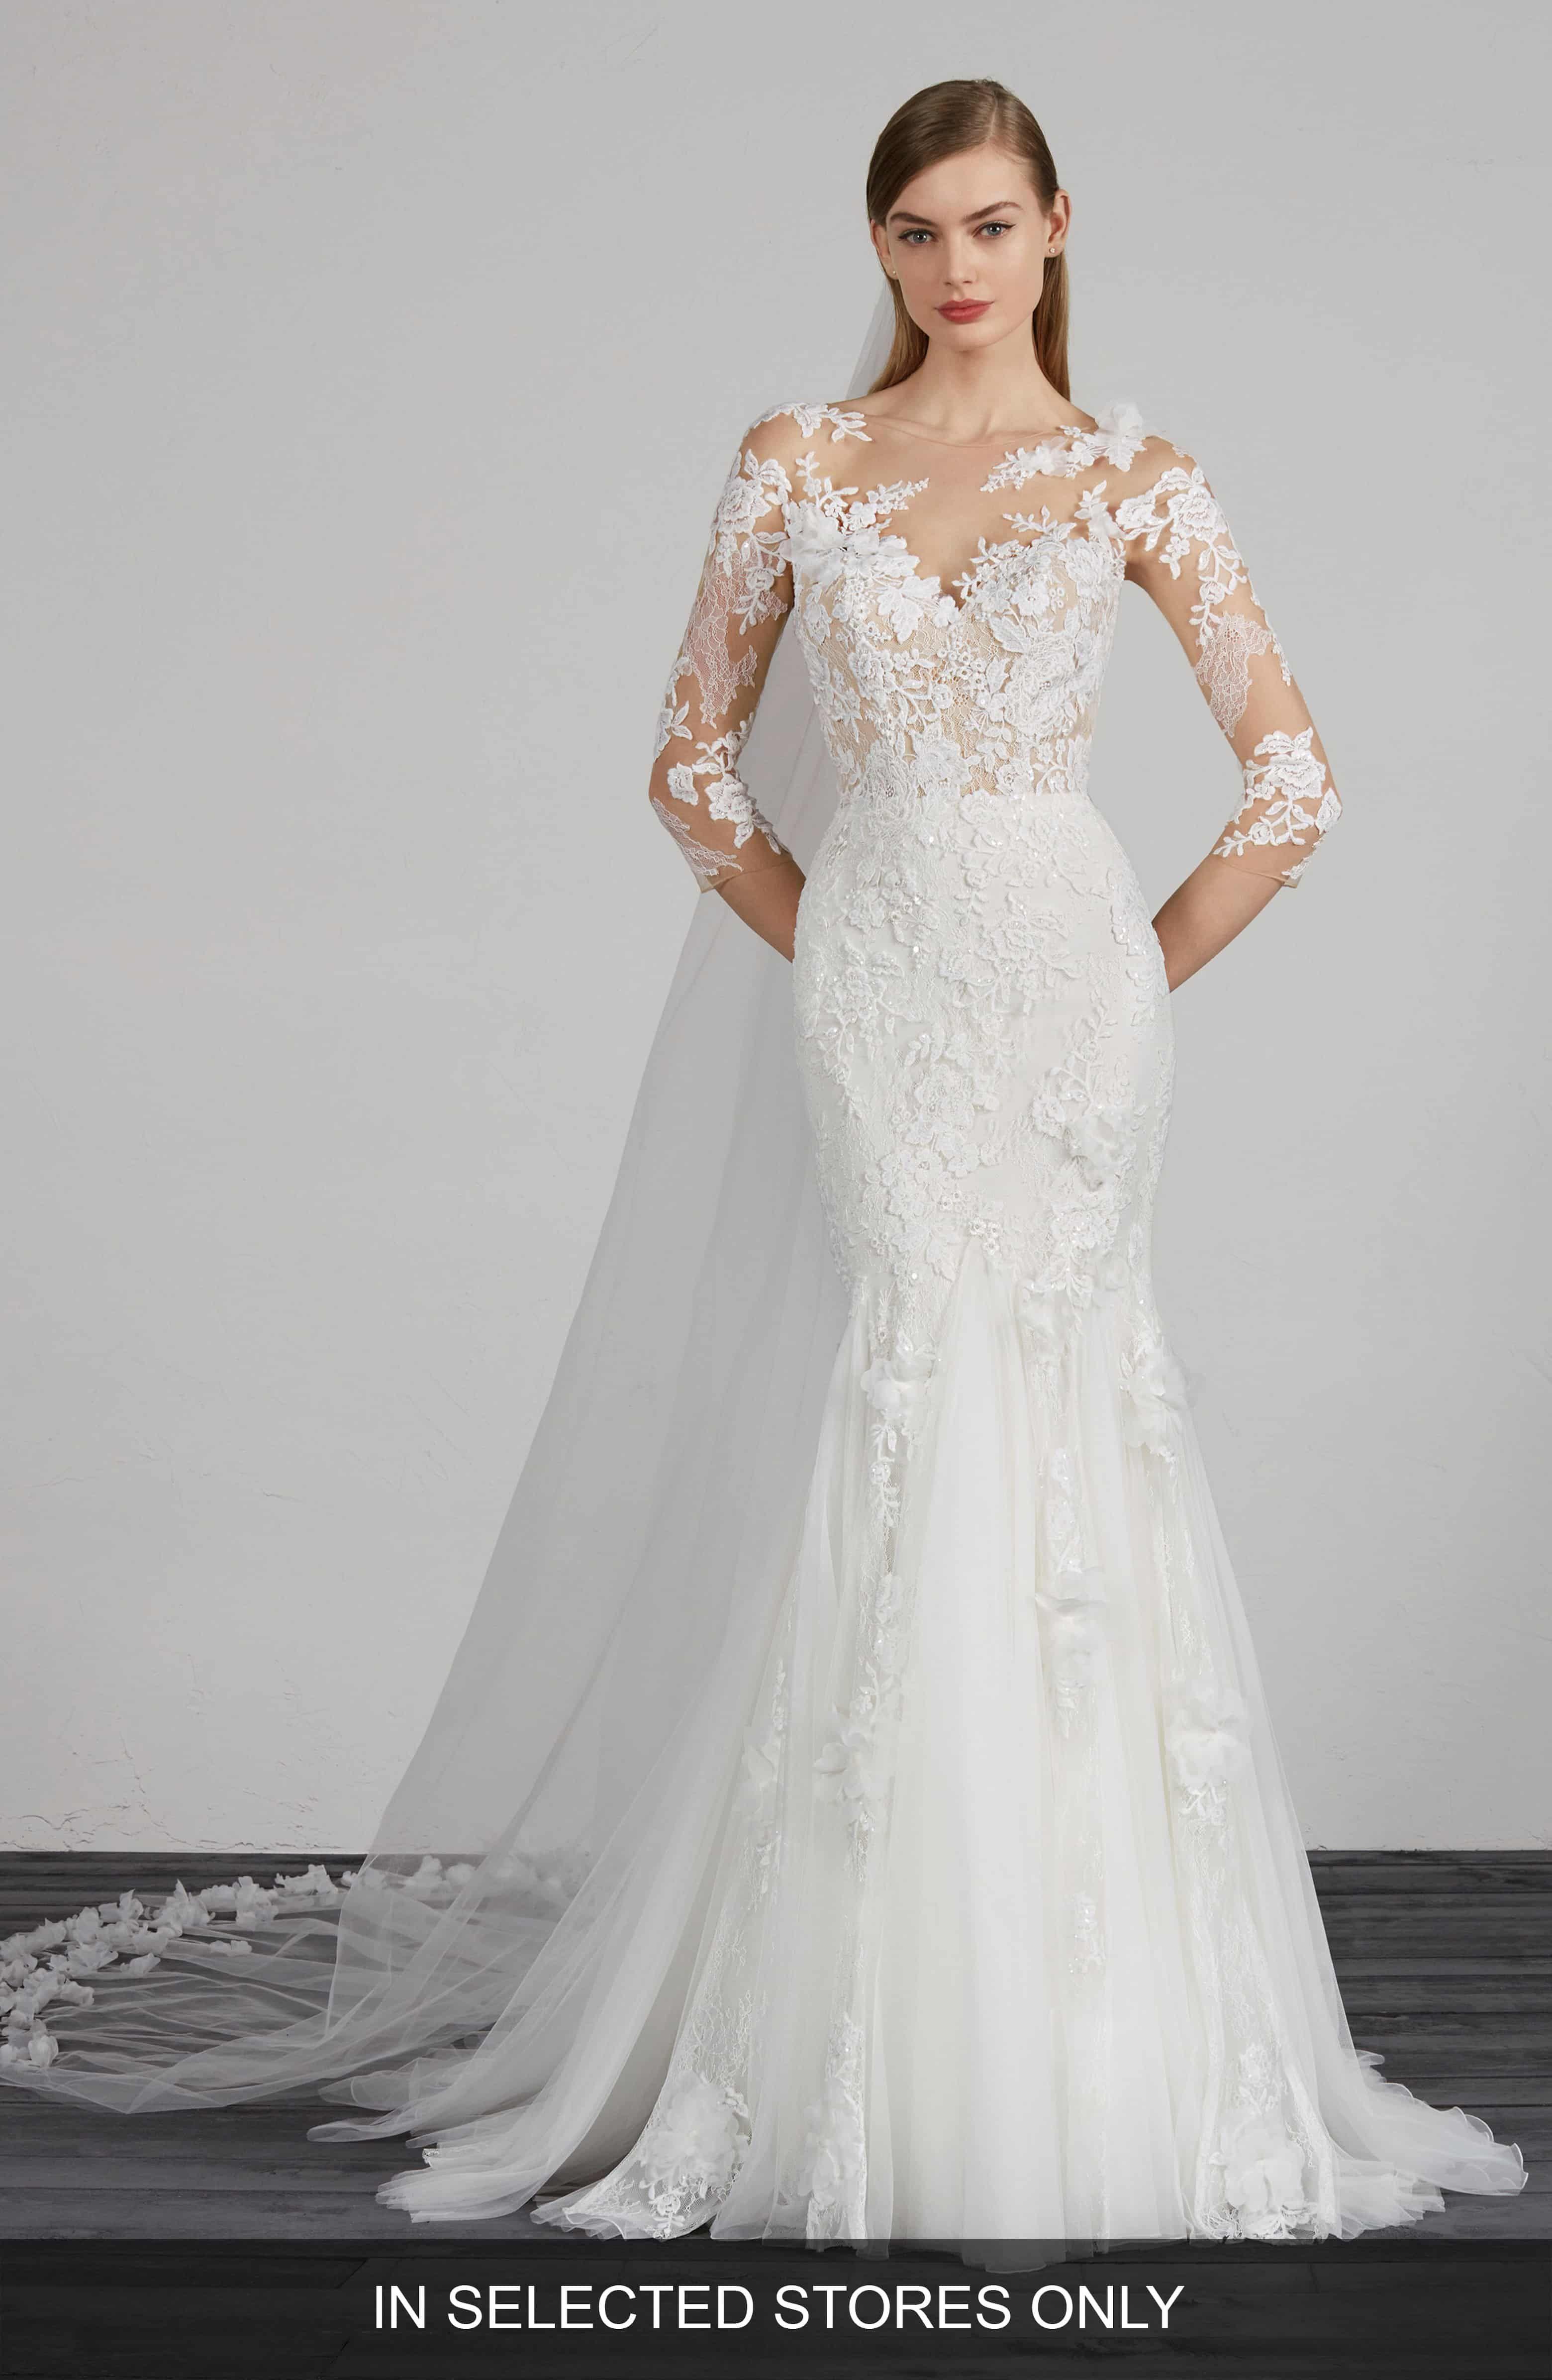 Pronovias Maden Lace Applique Mermaid Wedding Dress Nordstrom Wedding Dress Couture Wedding Dress Long Sleeve Wedding Dresses Romantic